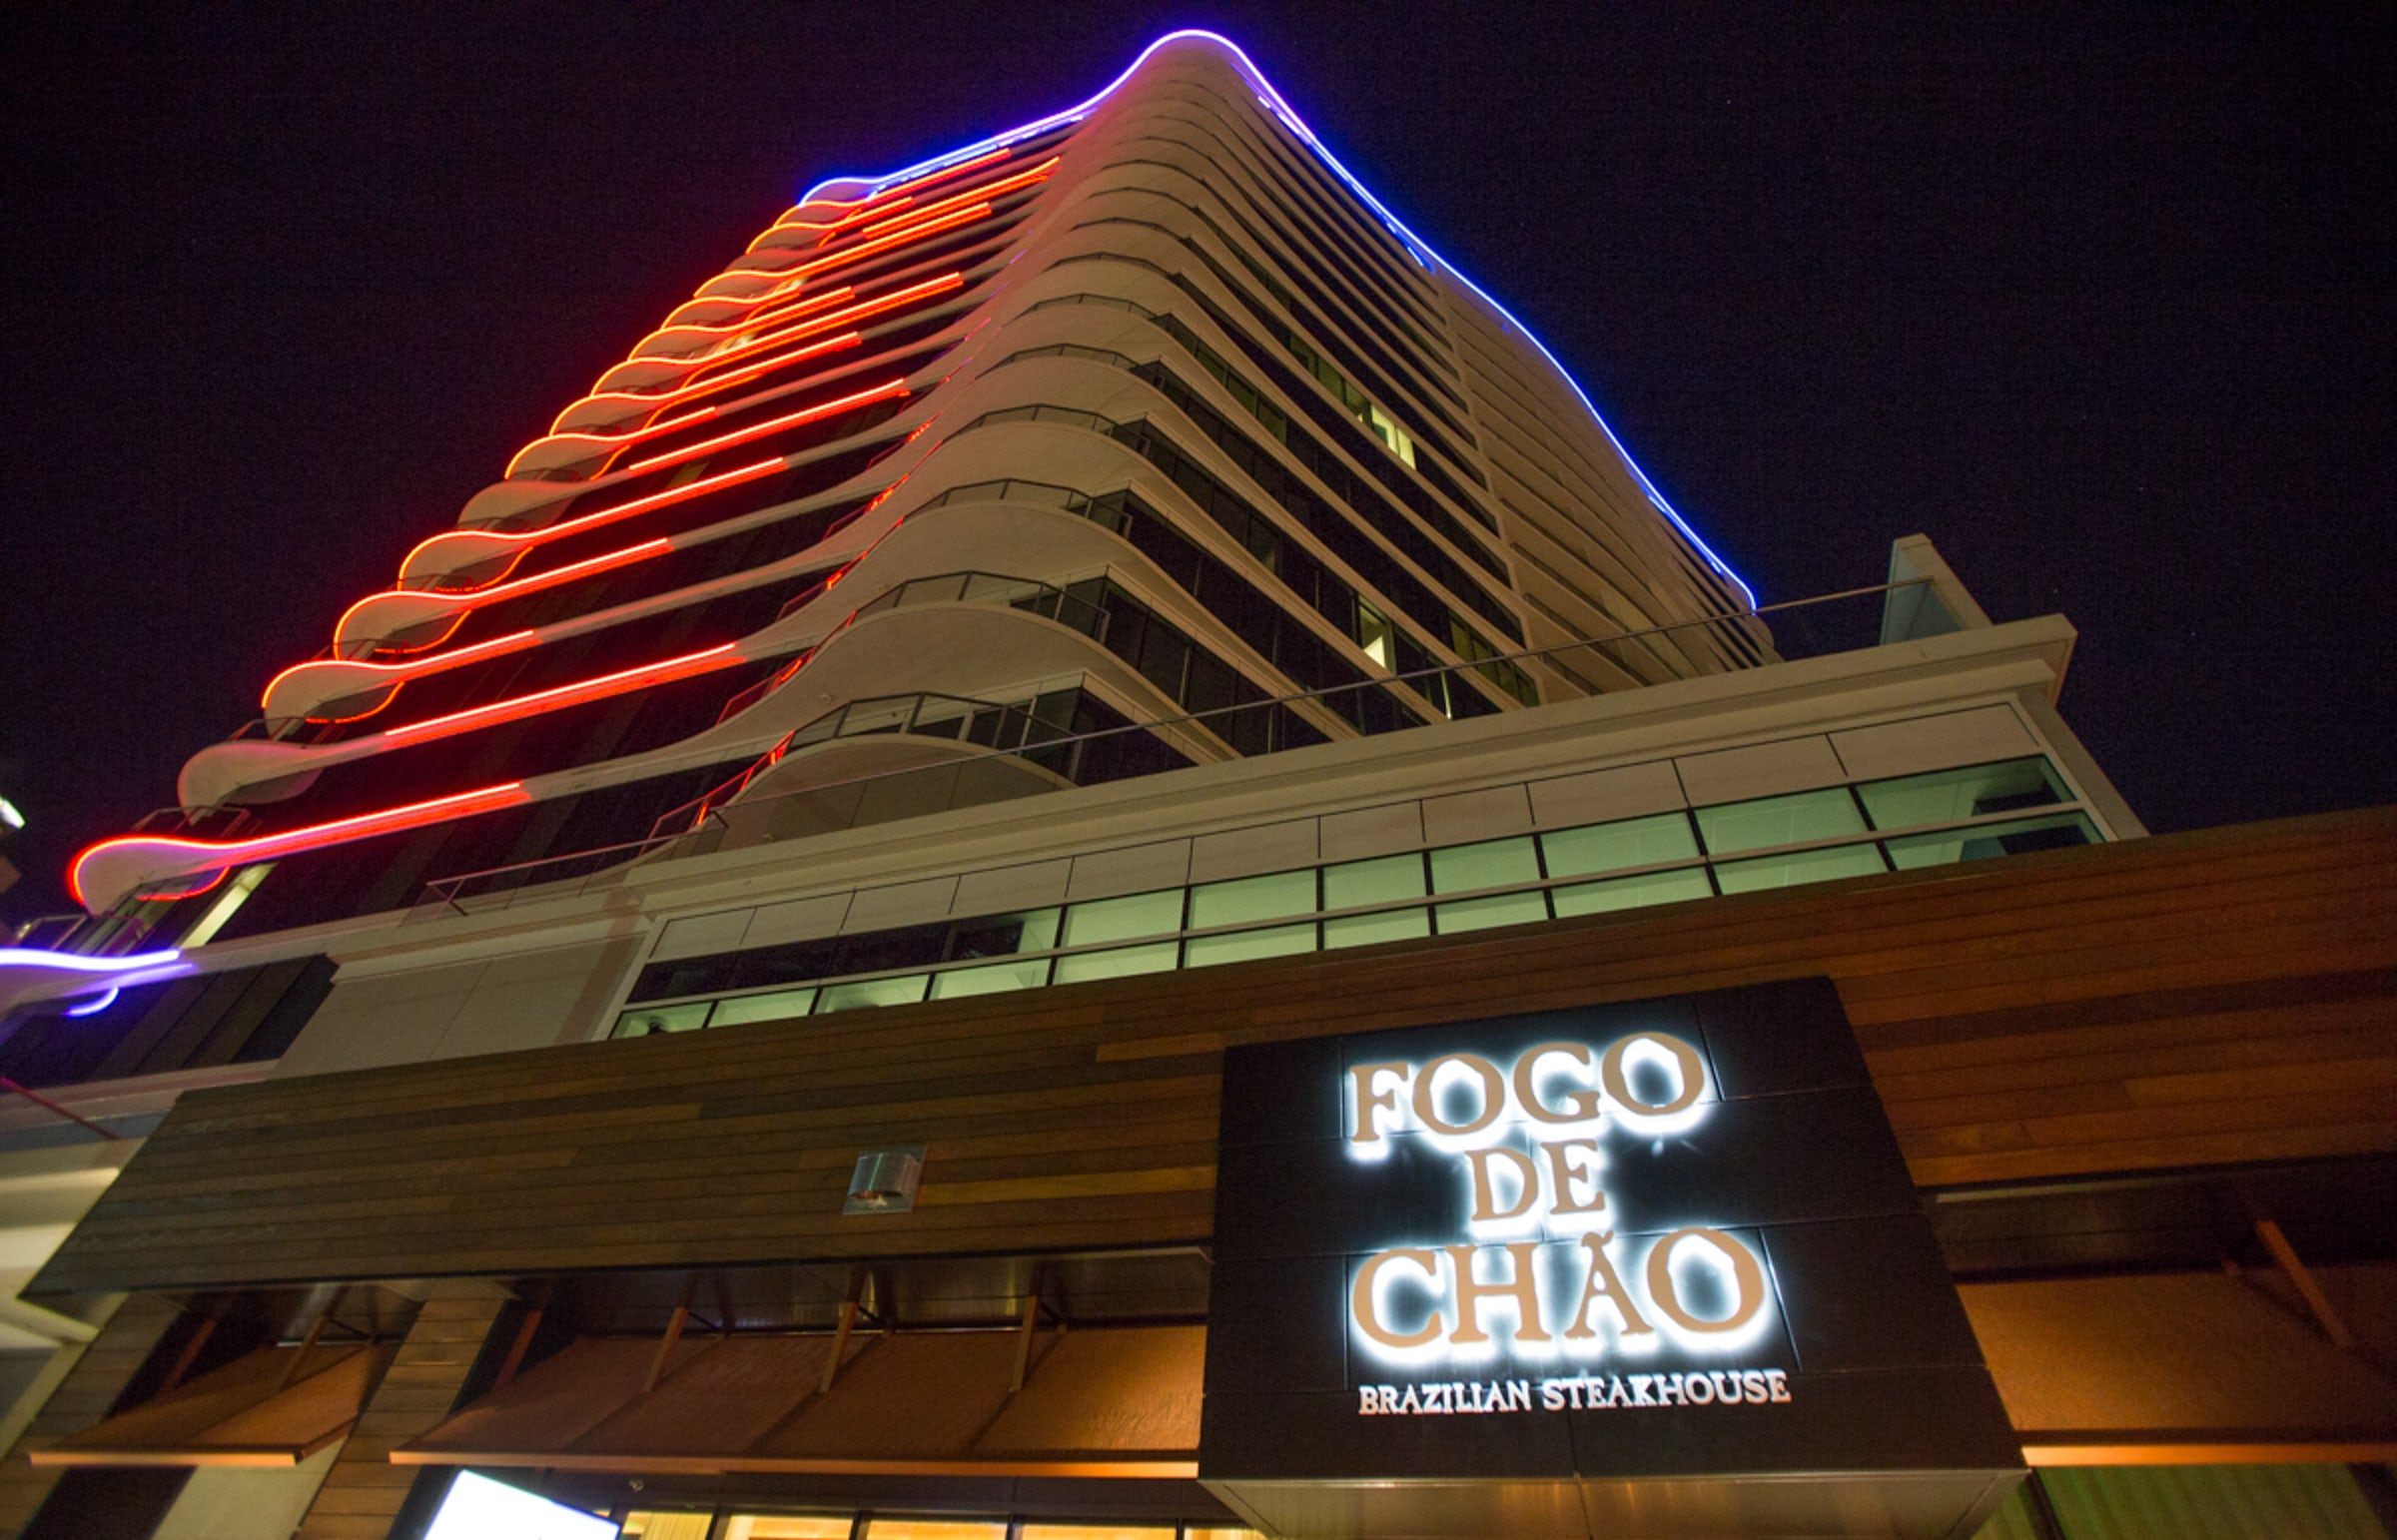 Fogo De Chao Churrascaria-Uptown in Beyond Dallas